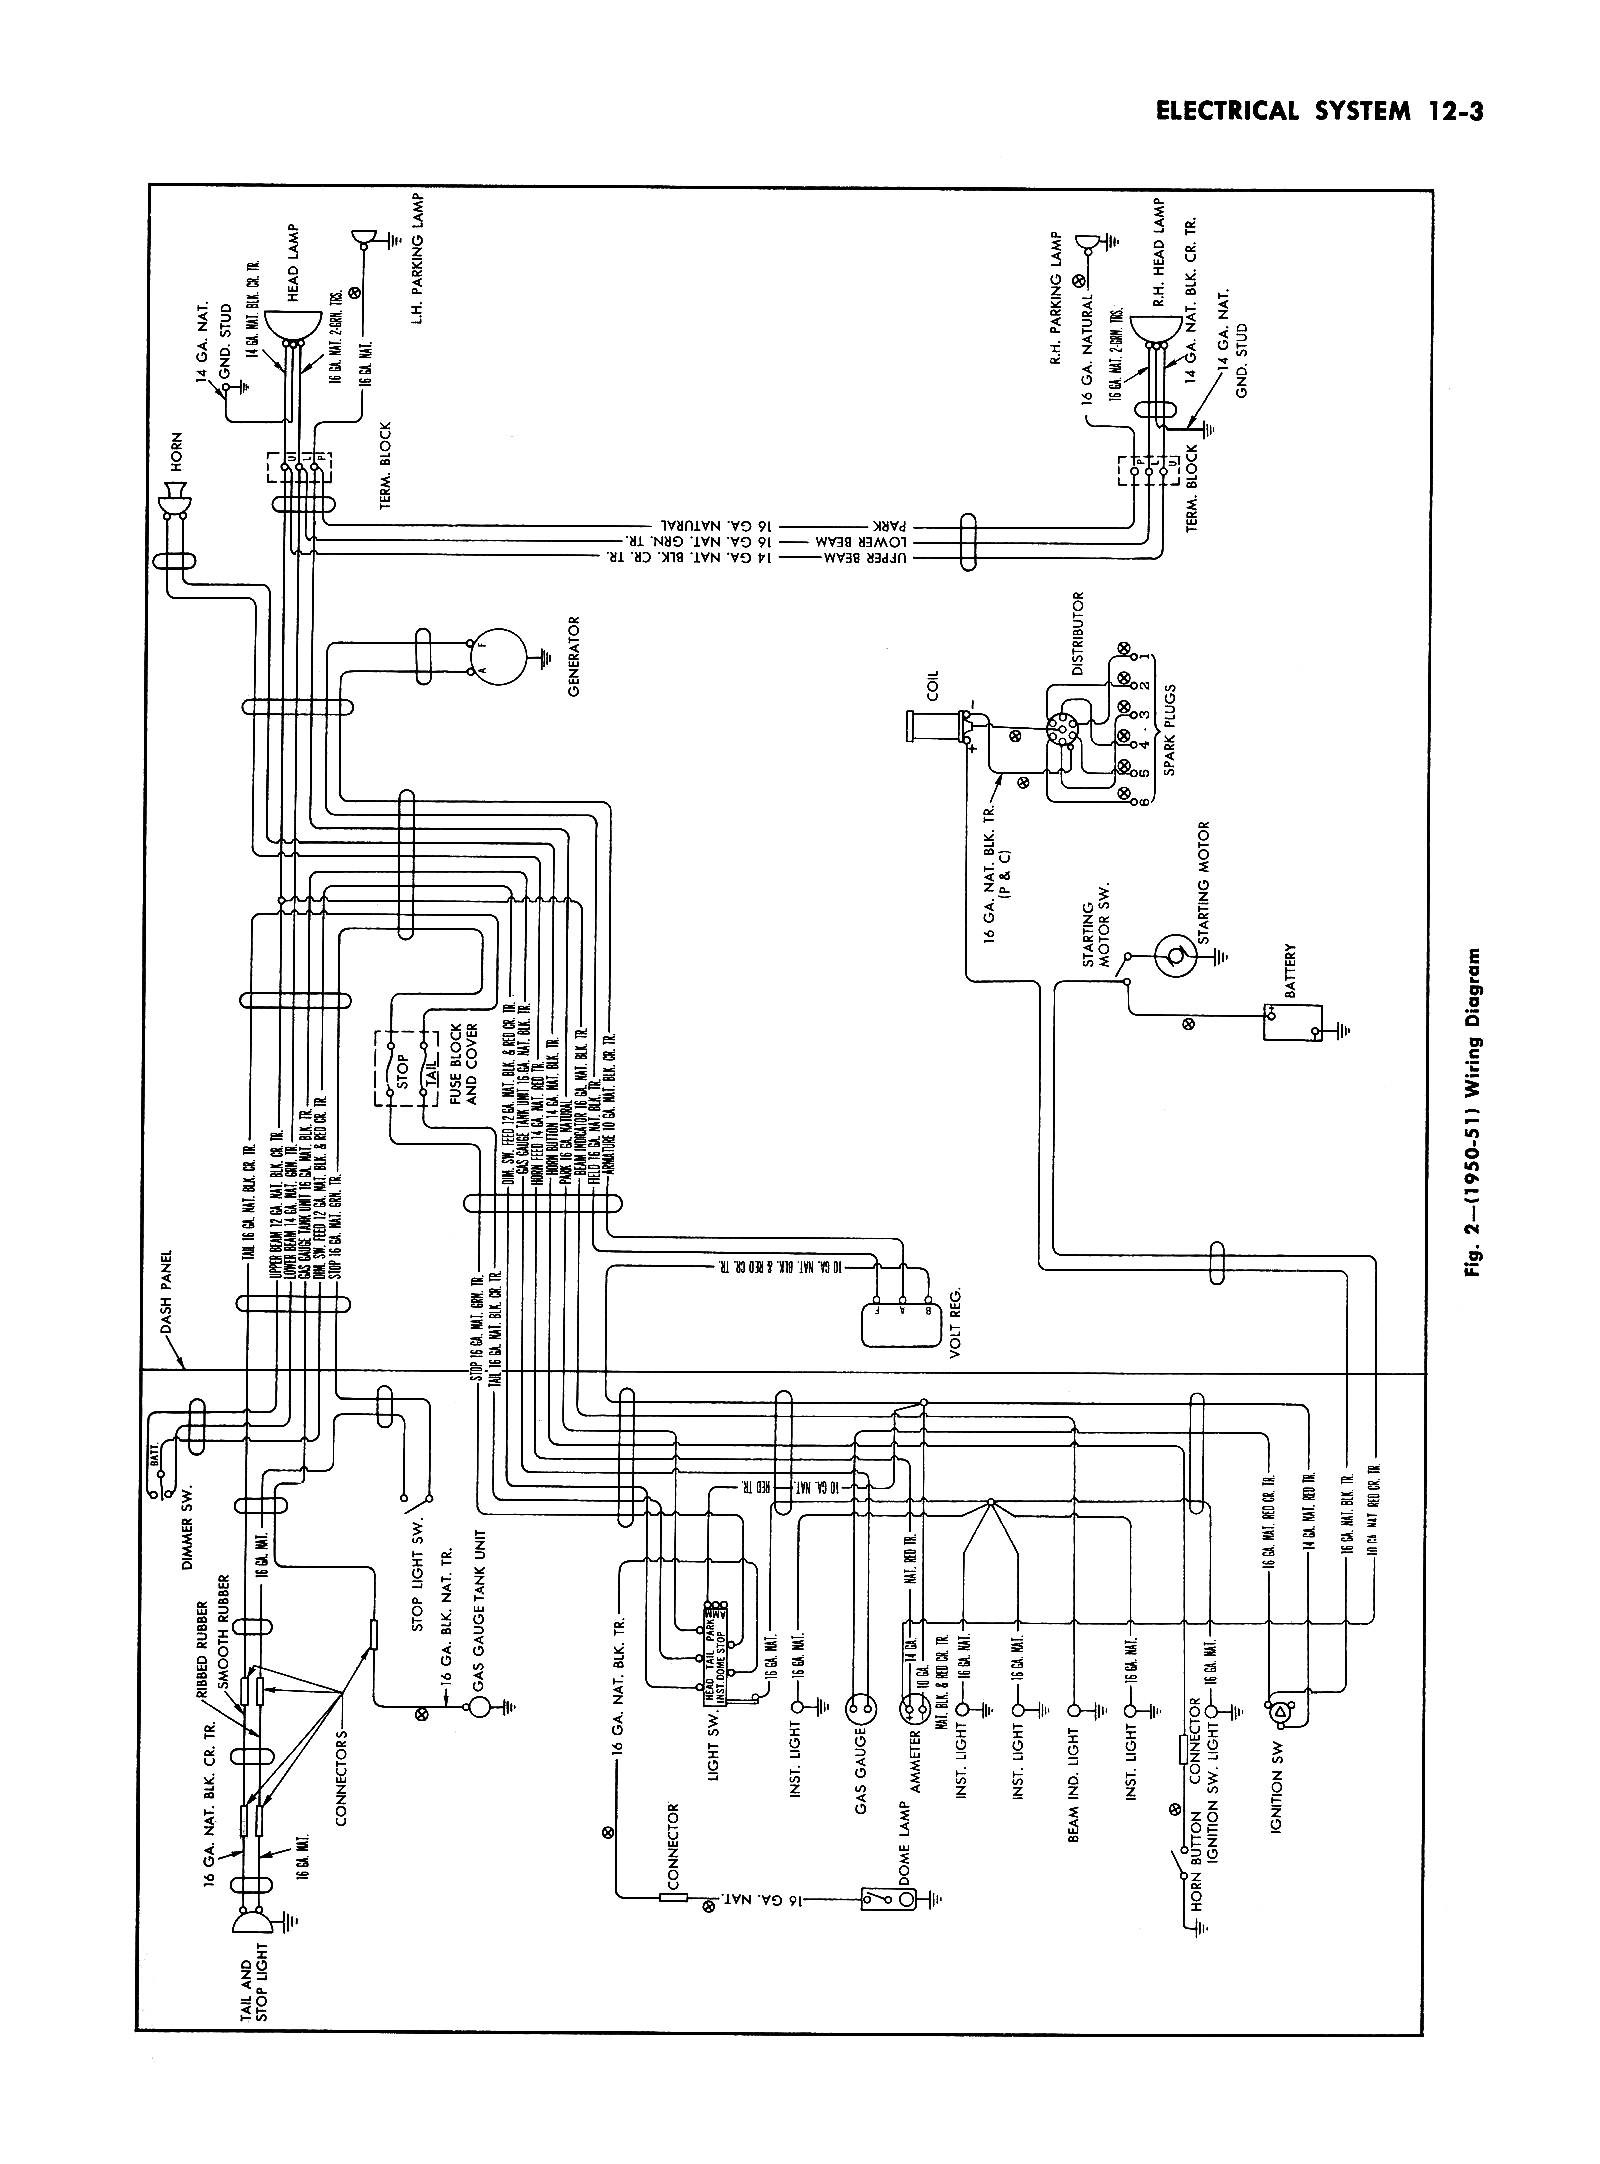 51 chevy bel air wiring diagram